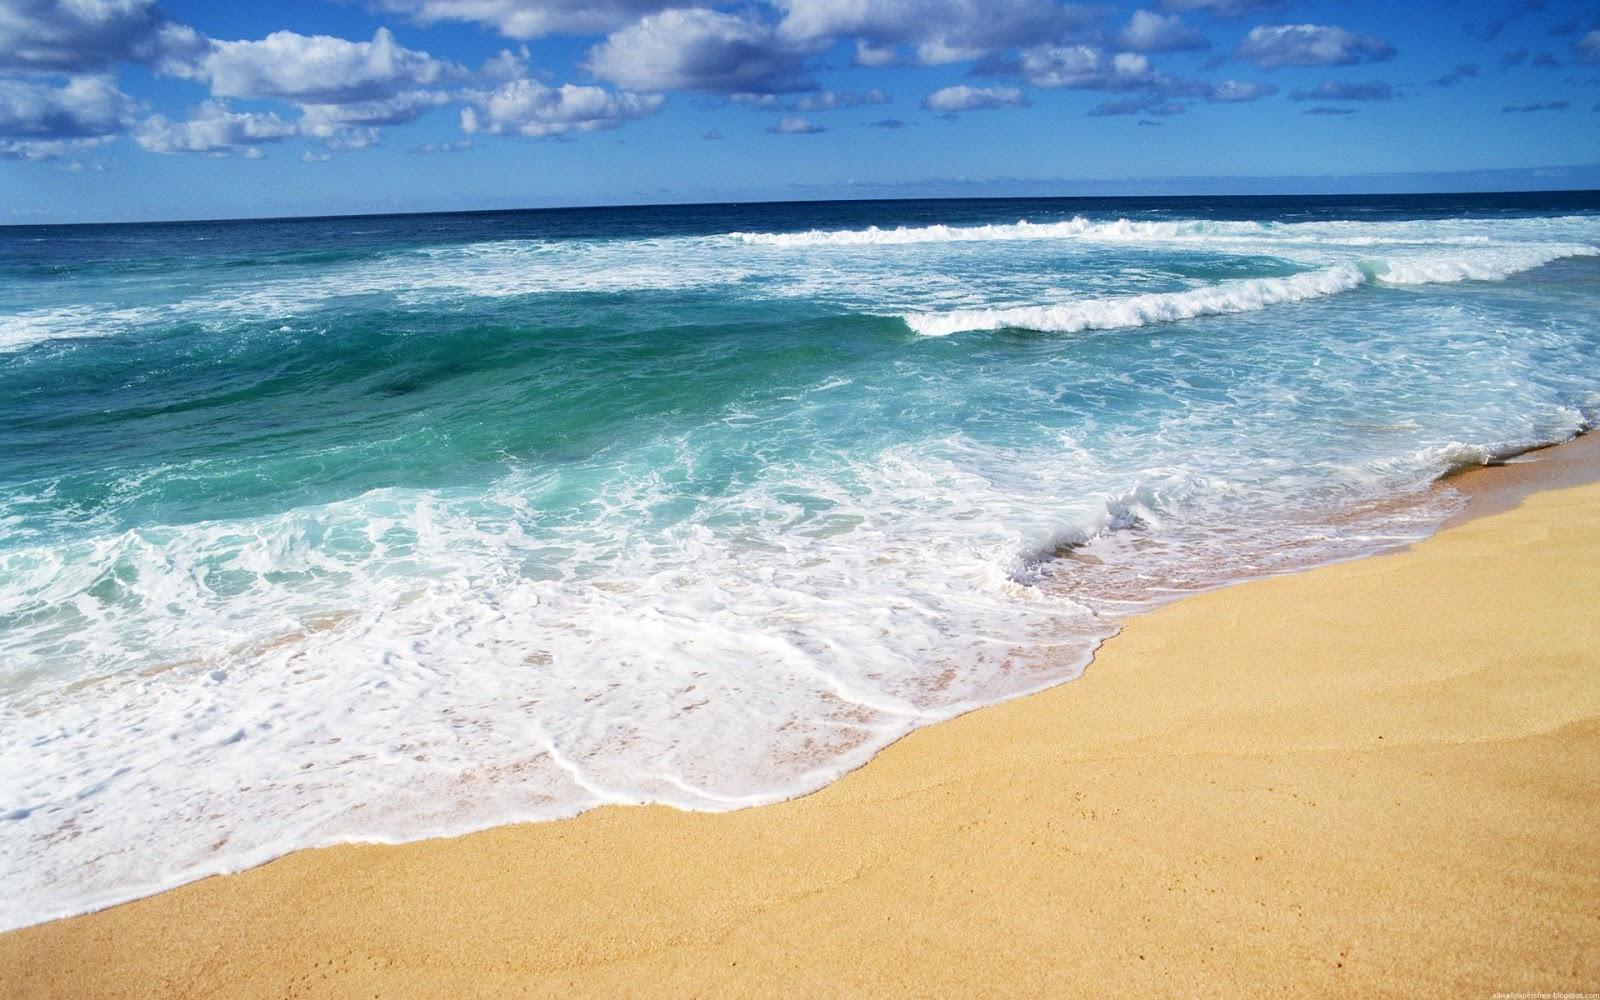 Online Wallpapers Shop: Beach Wallpaper | Beach Pictures Backgrounds | Free Beach Desktop Images